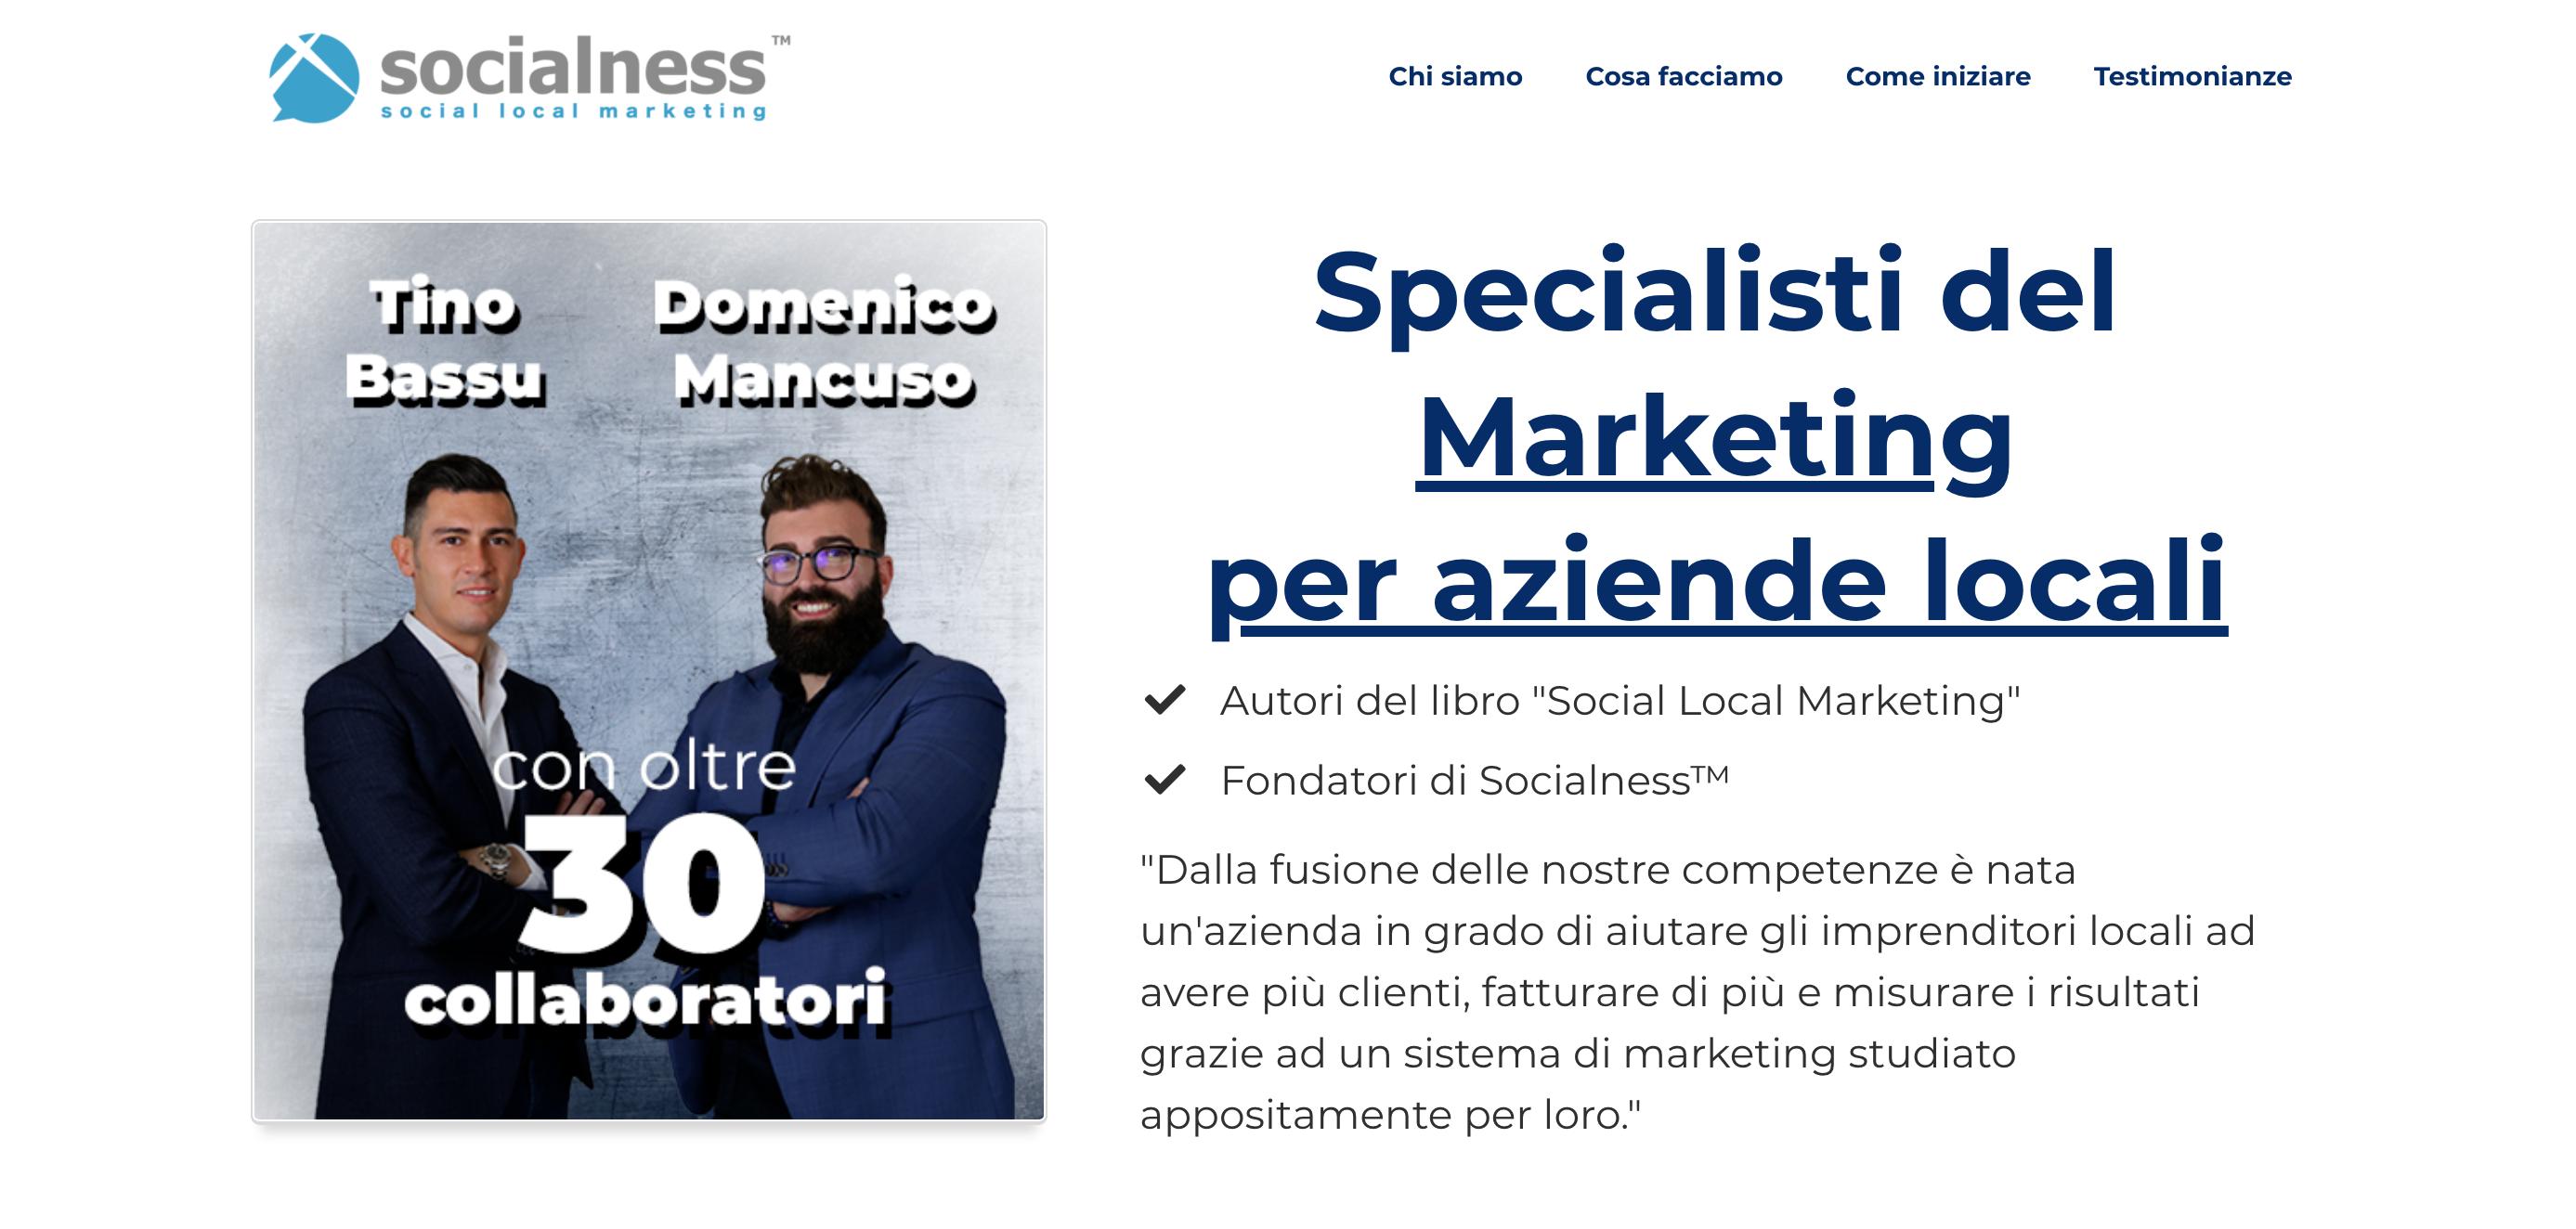 Socialness social local marketing